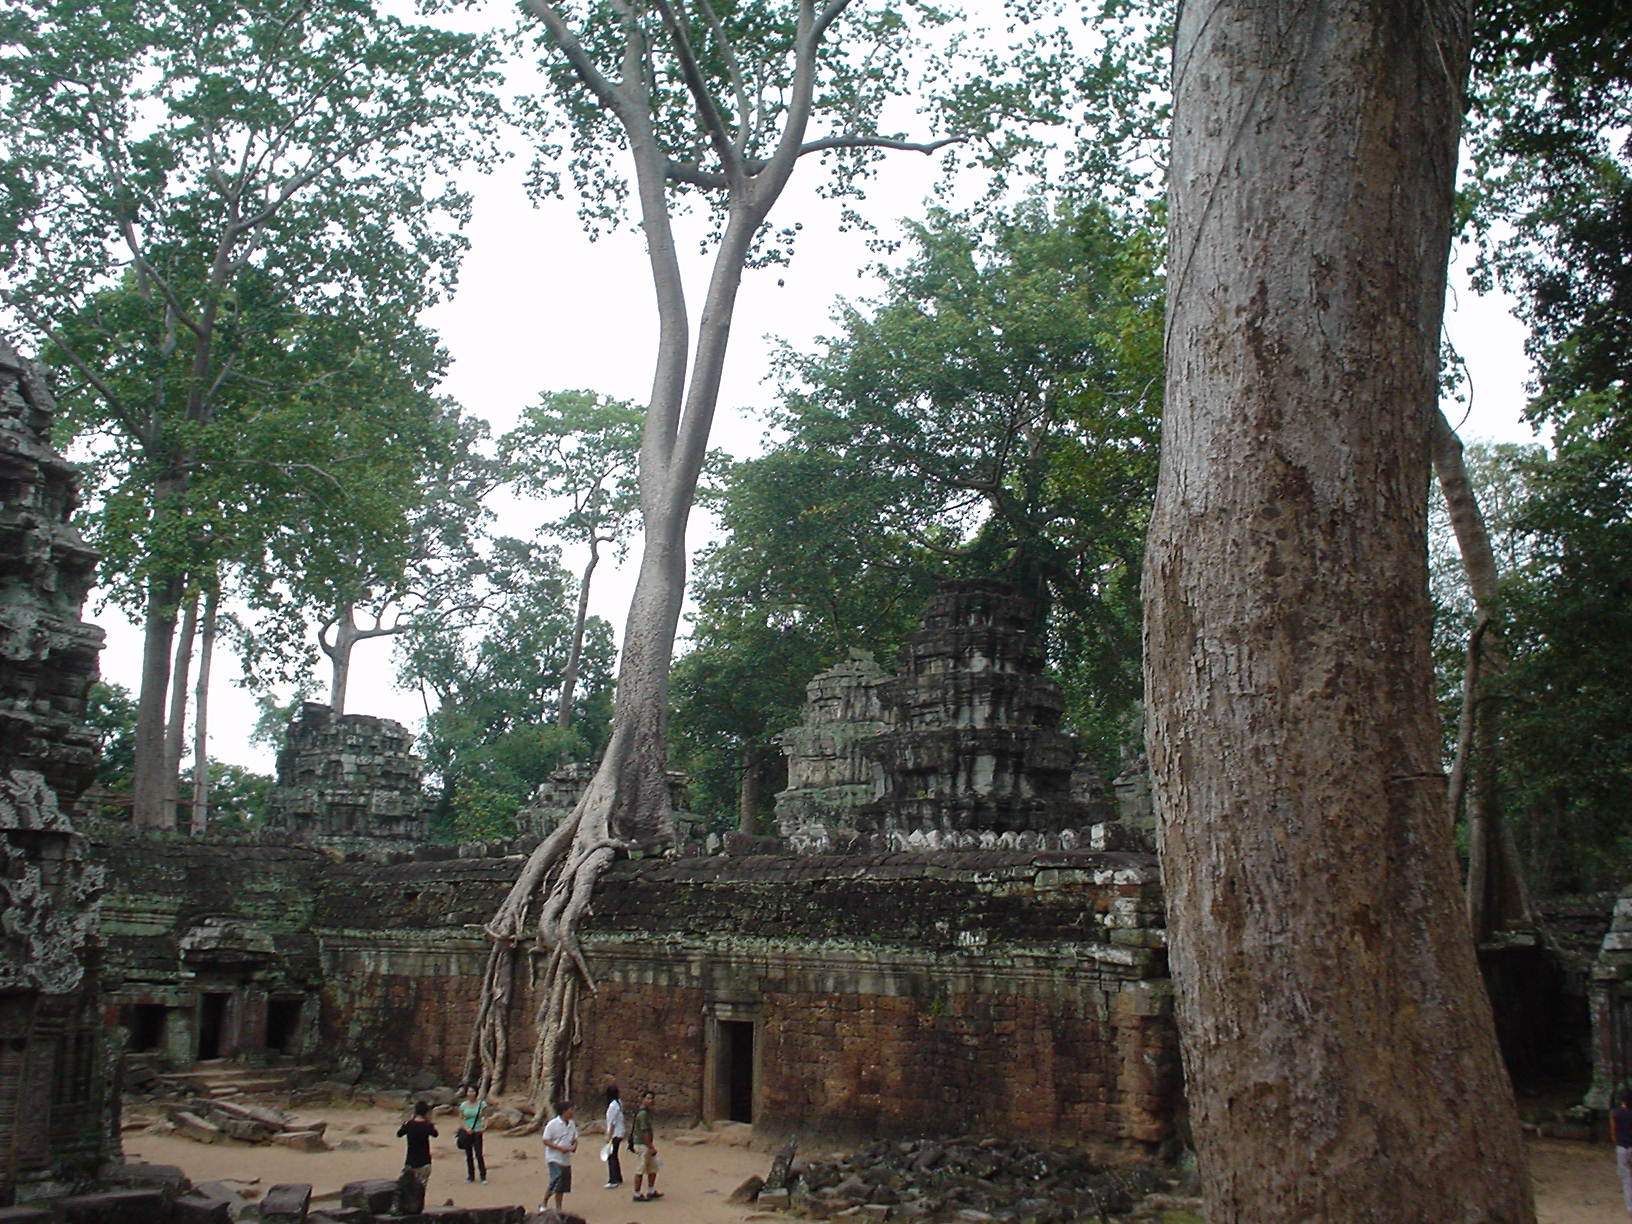 Siem Reap (Camboya) - Templo de laJungla